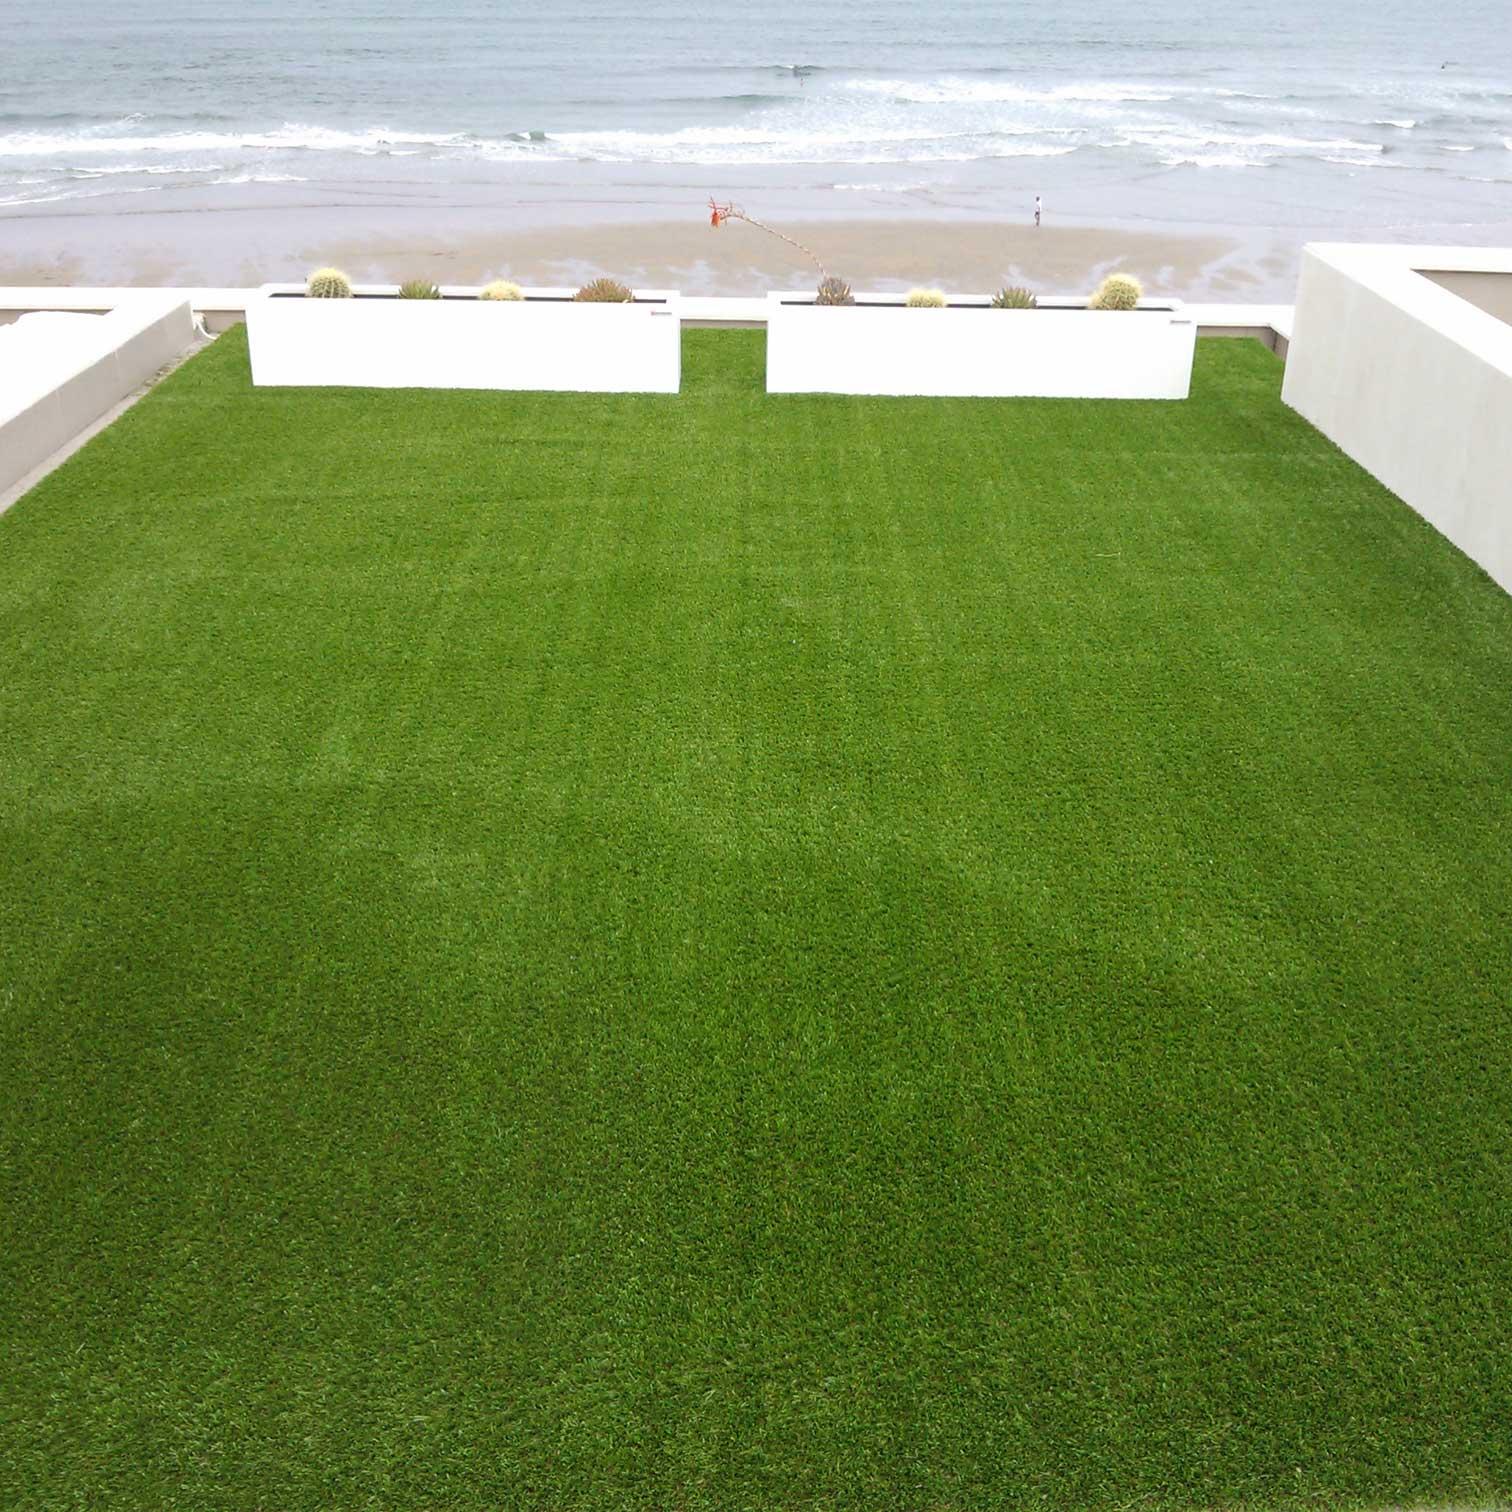 cesped artificial terraza mar asturias - Cesped Artificial Terraza